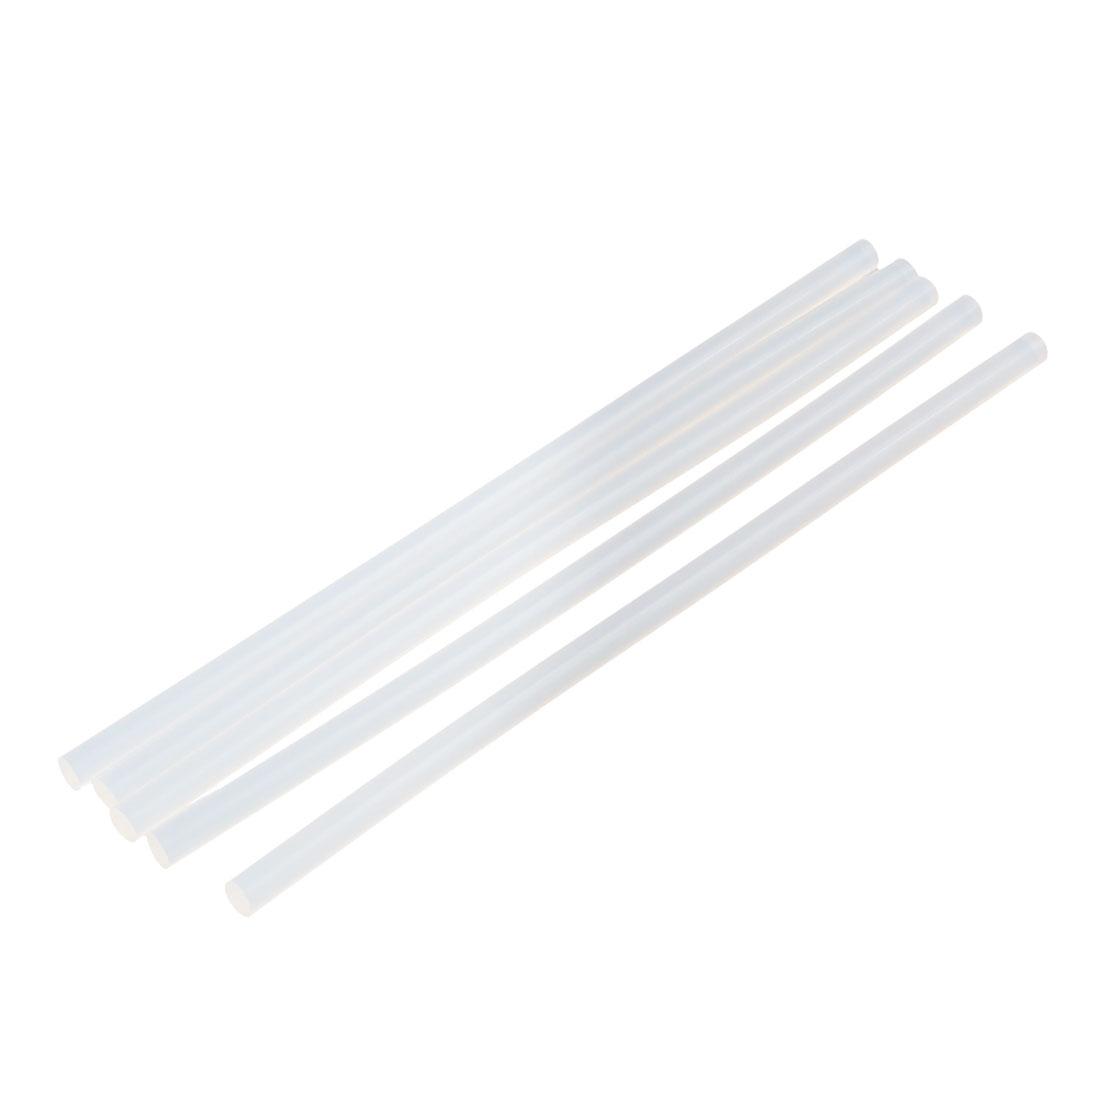 5 Pcs 7mm x 200mm Hot Melt Glue Adhesive Stick Clear for Electric Tool Heating Gun